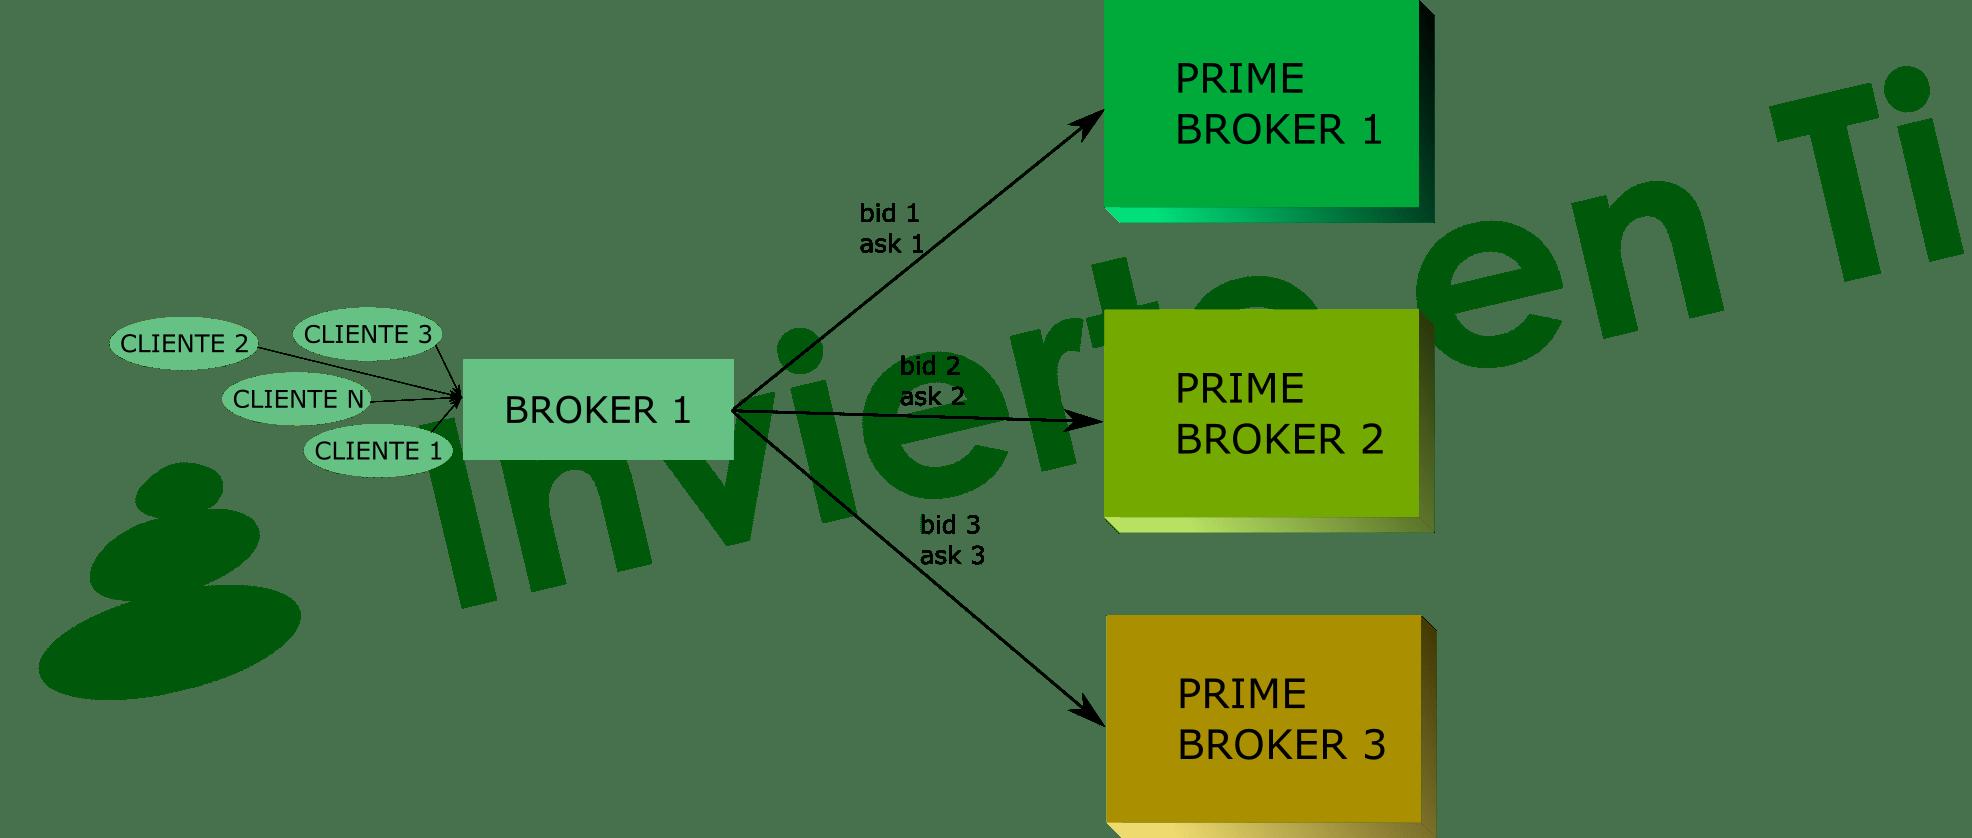 prime broker invierte en ti forex